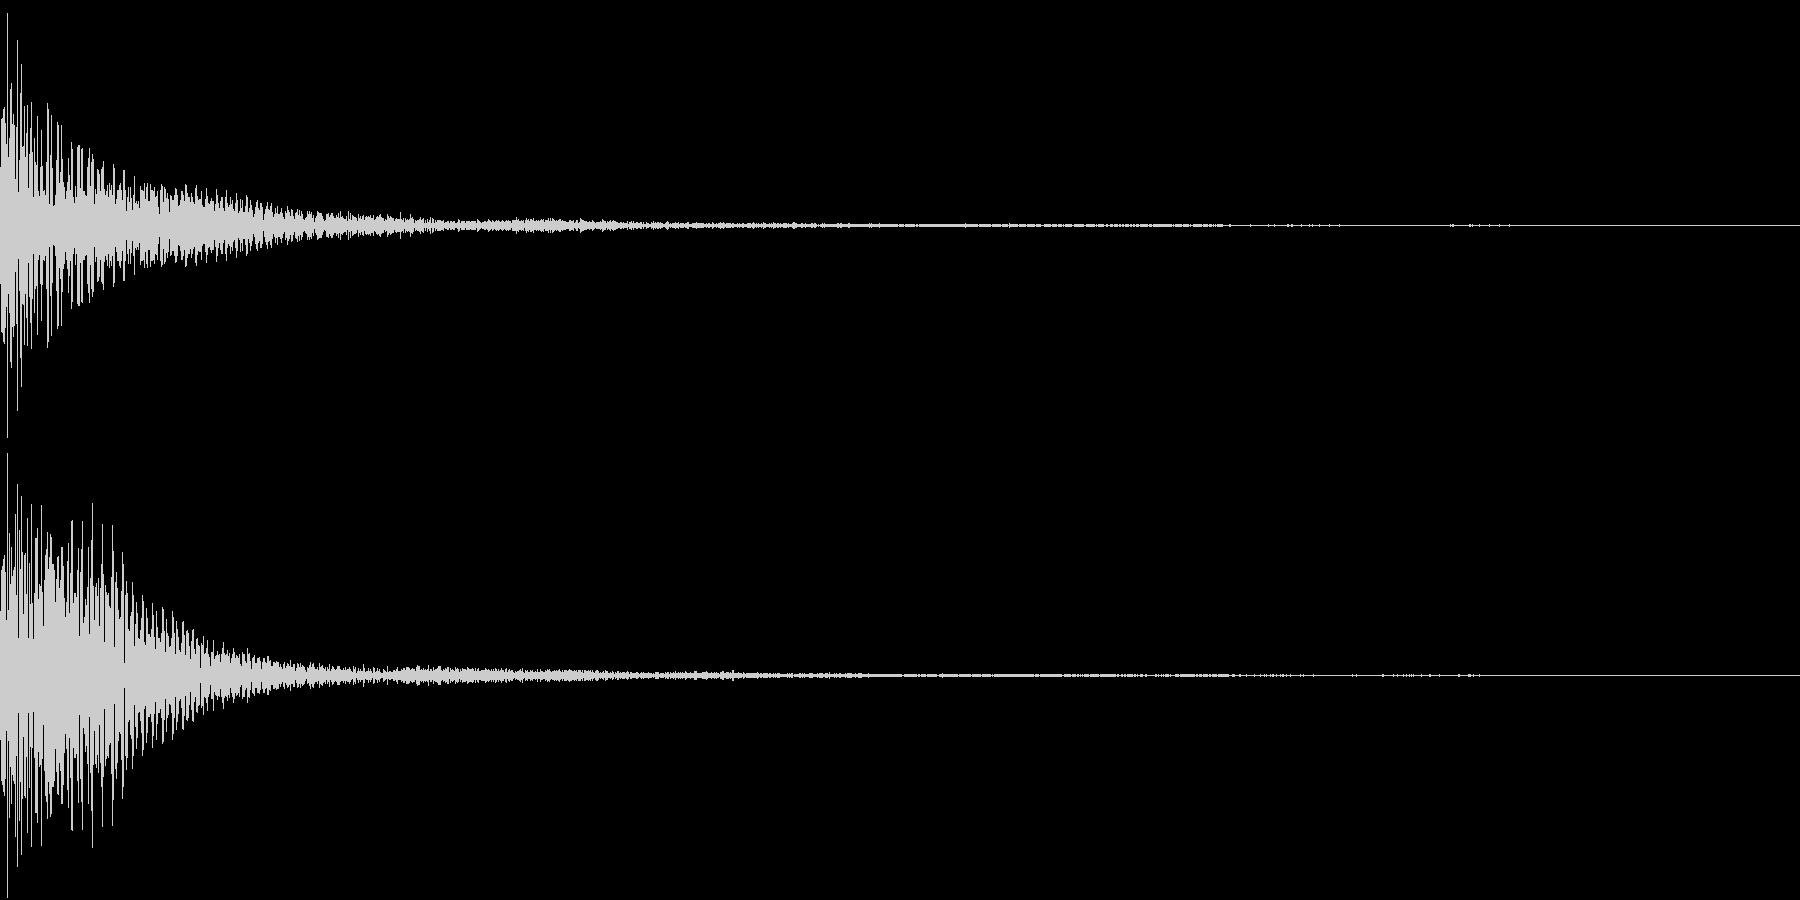 SFX ドーン! 重低音アイキャッチの未再生の波形